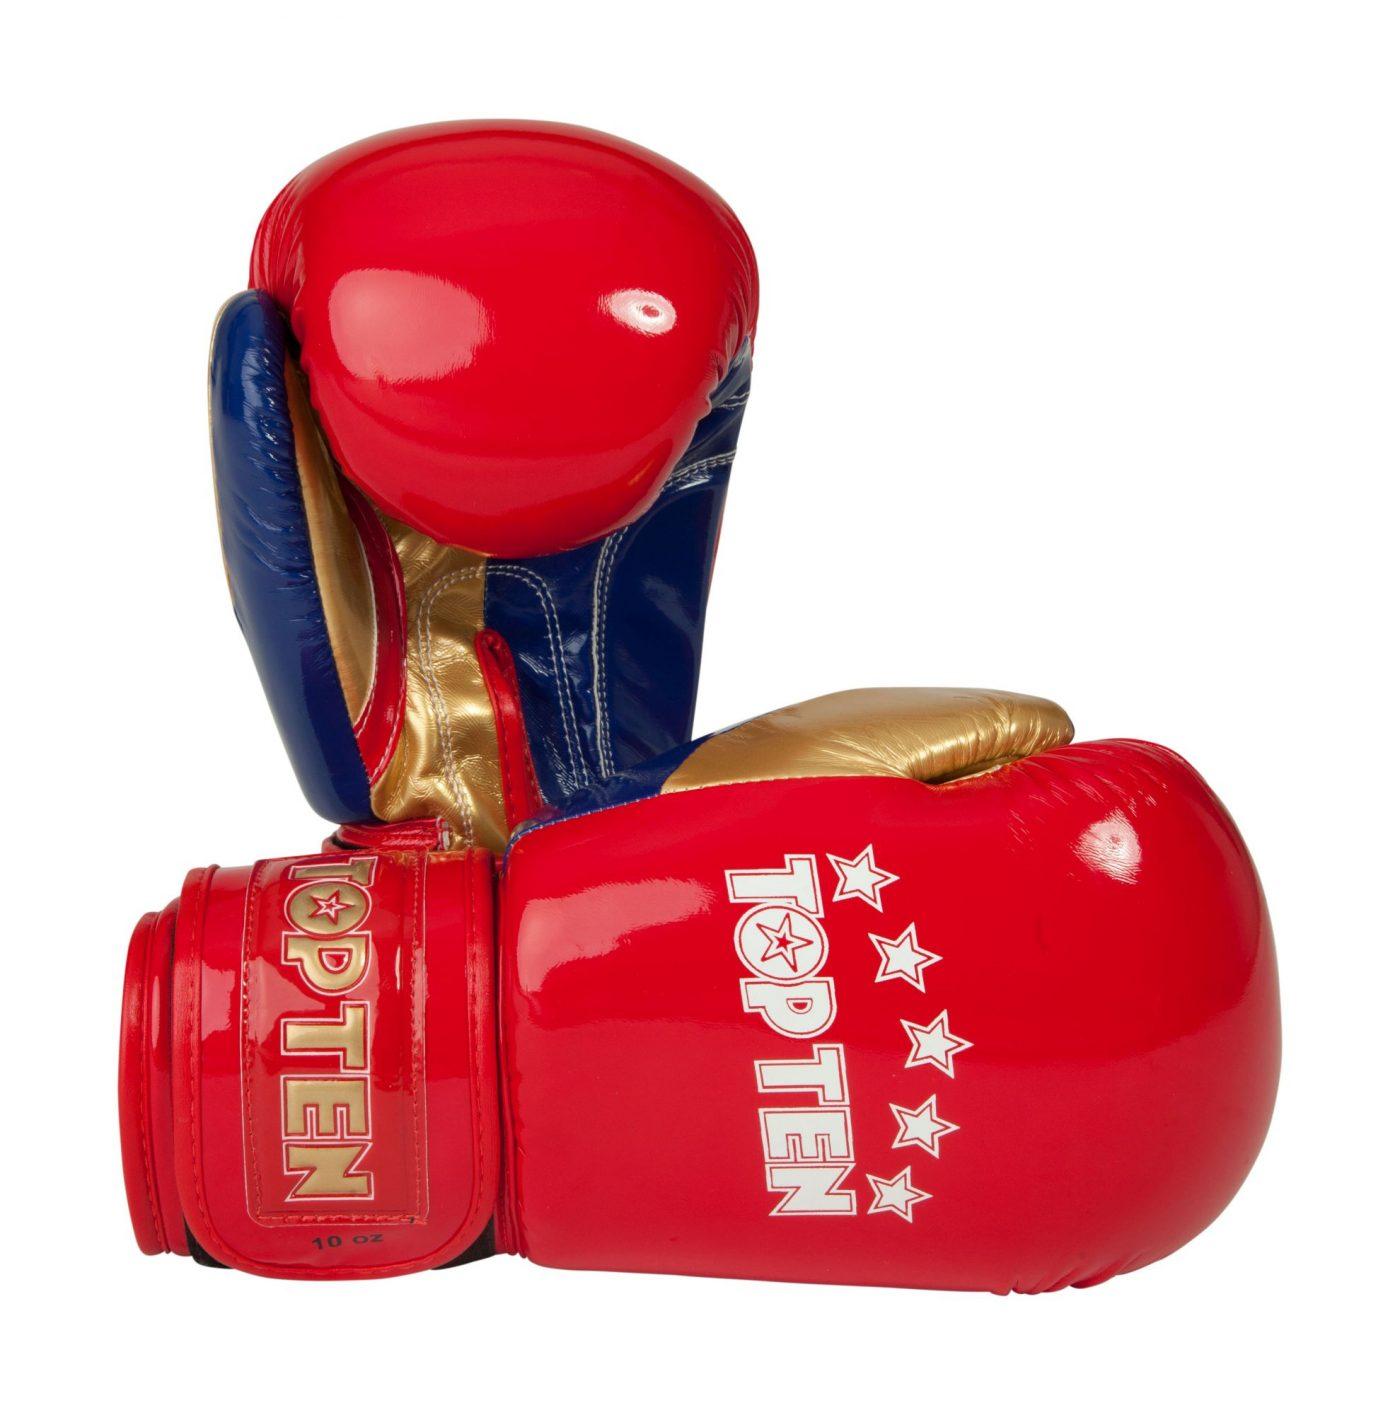 "Bokshandschoenen ""Champion"" in glossy look goud - rood"